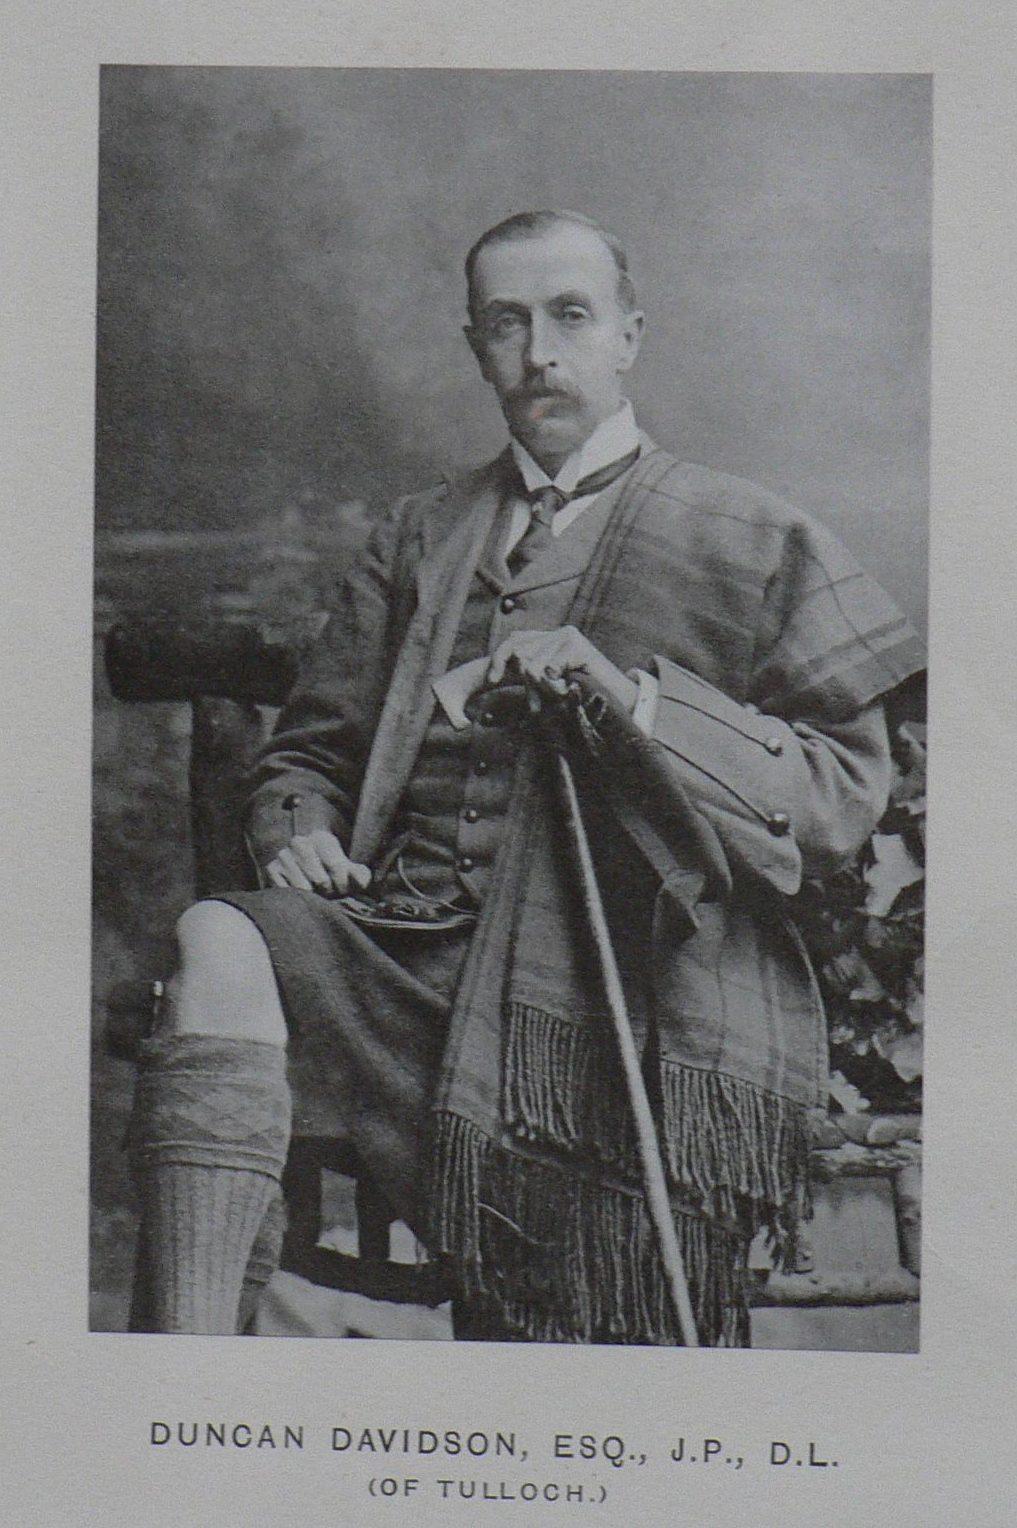 Duncan Davidson at Tulloch Castle